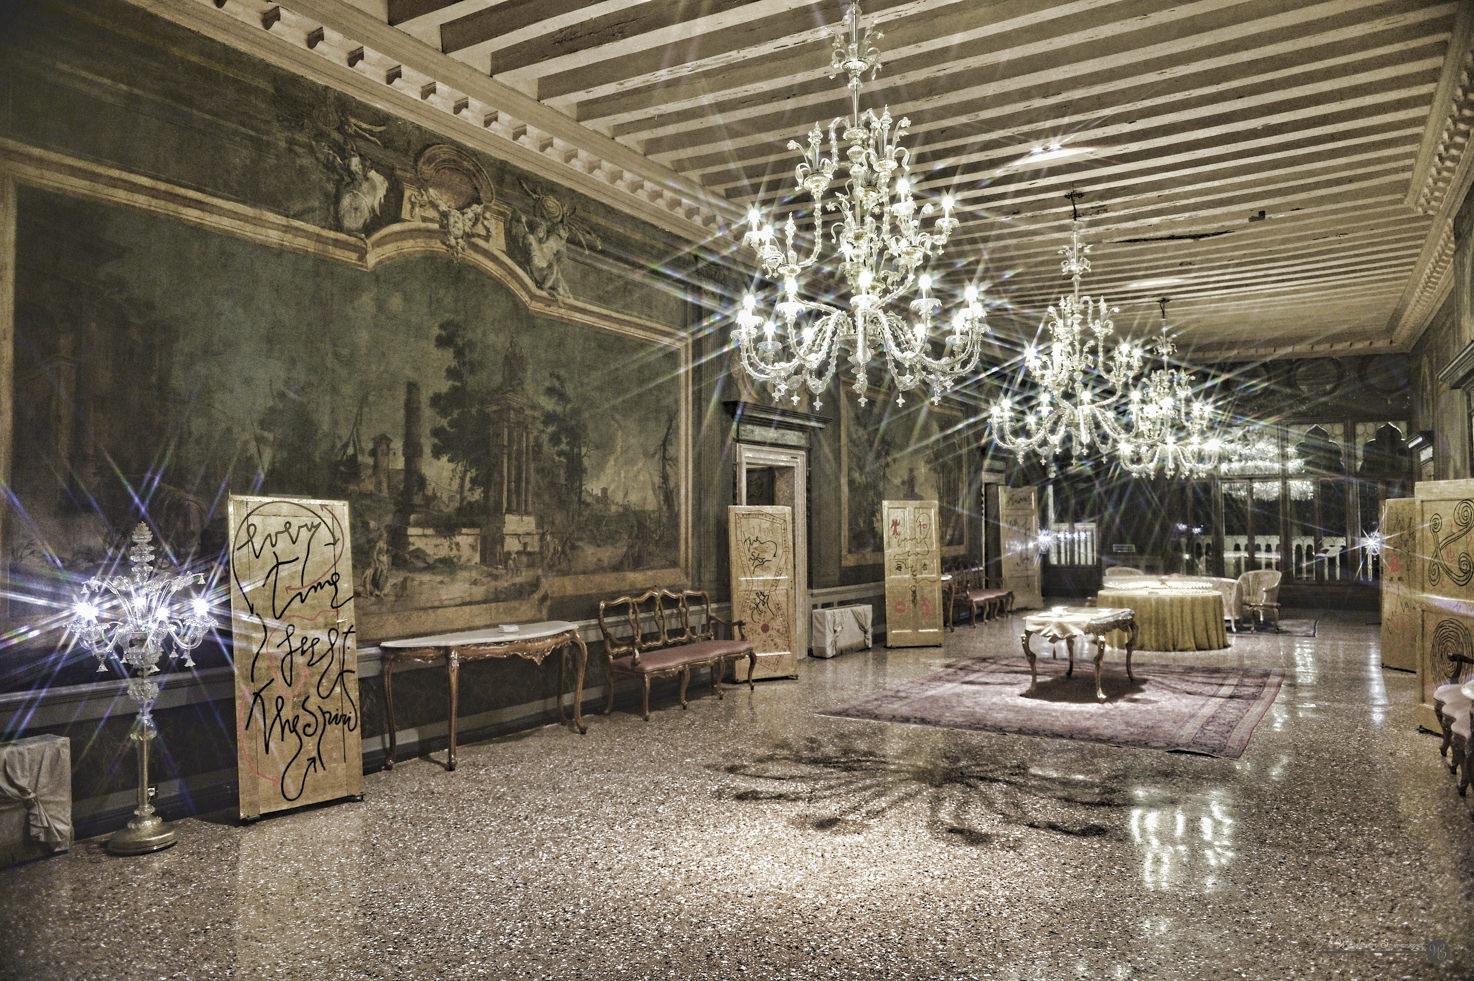 Portego Hall for wedding receptions at Cà Sagredo